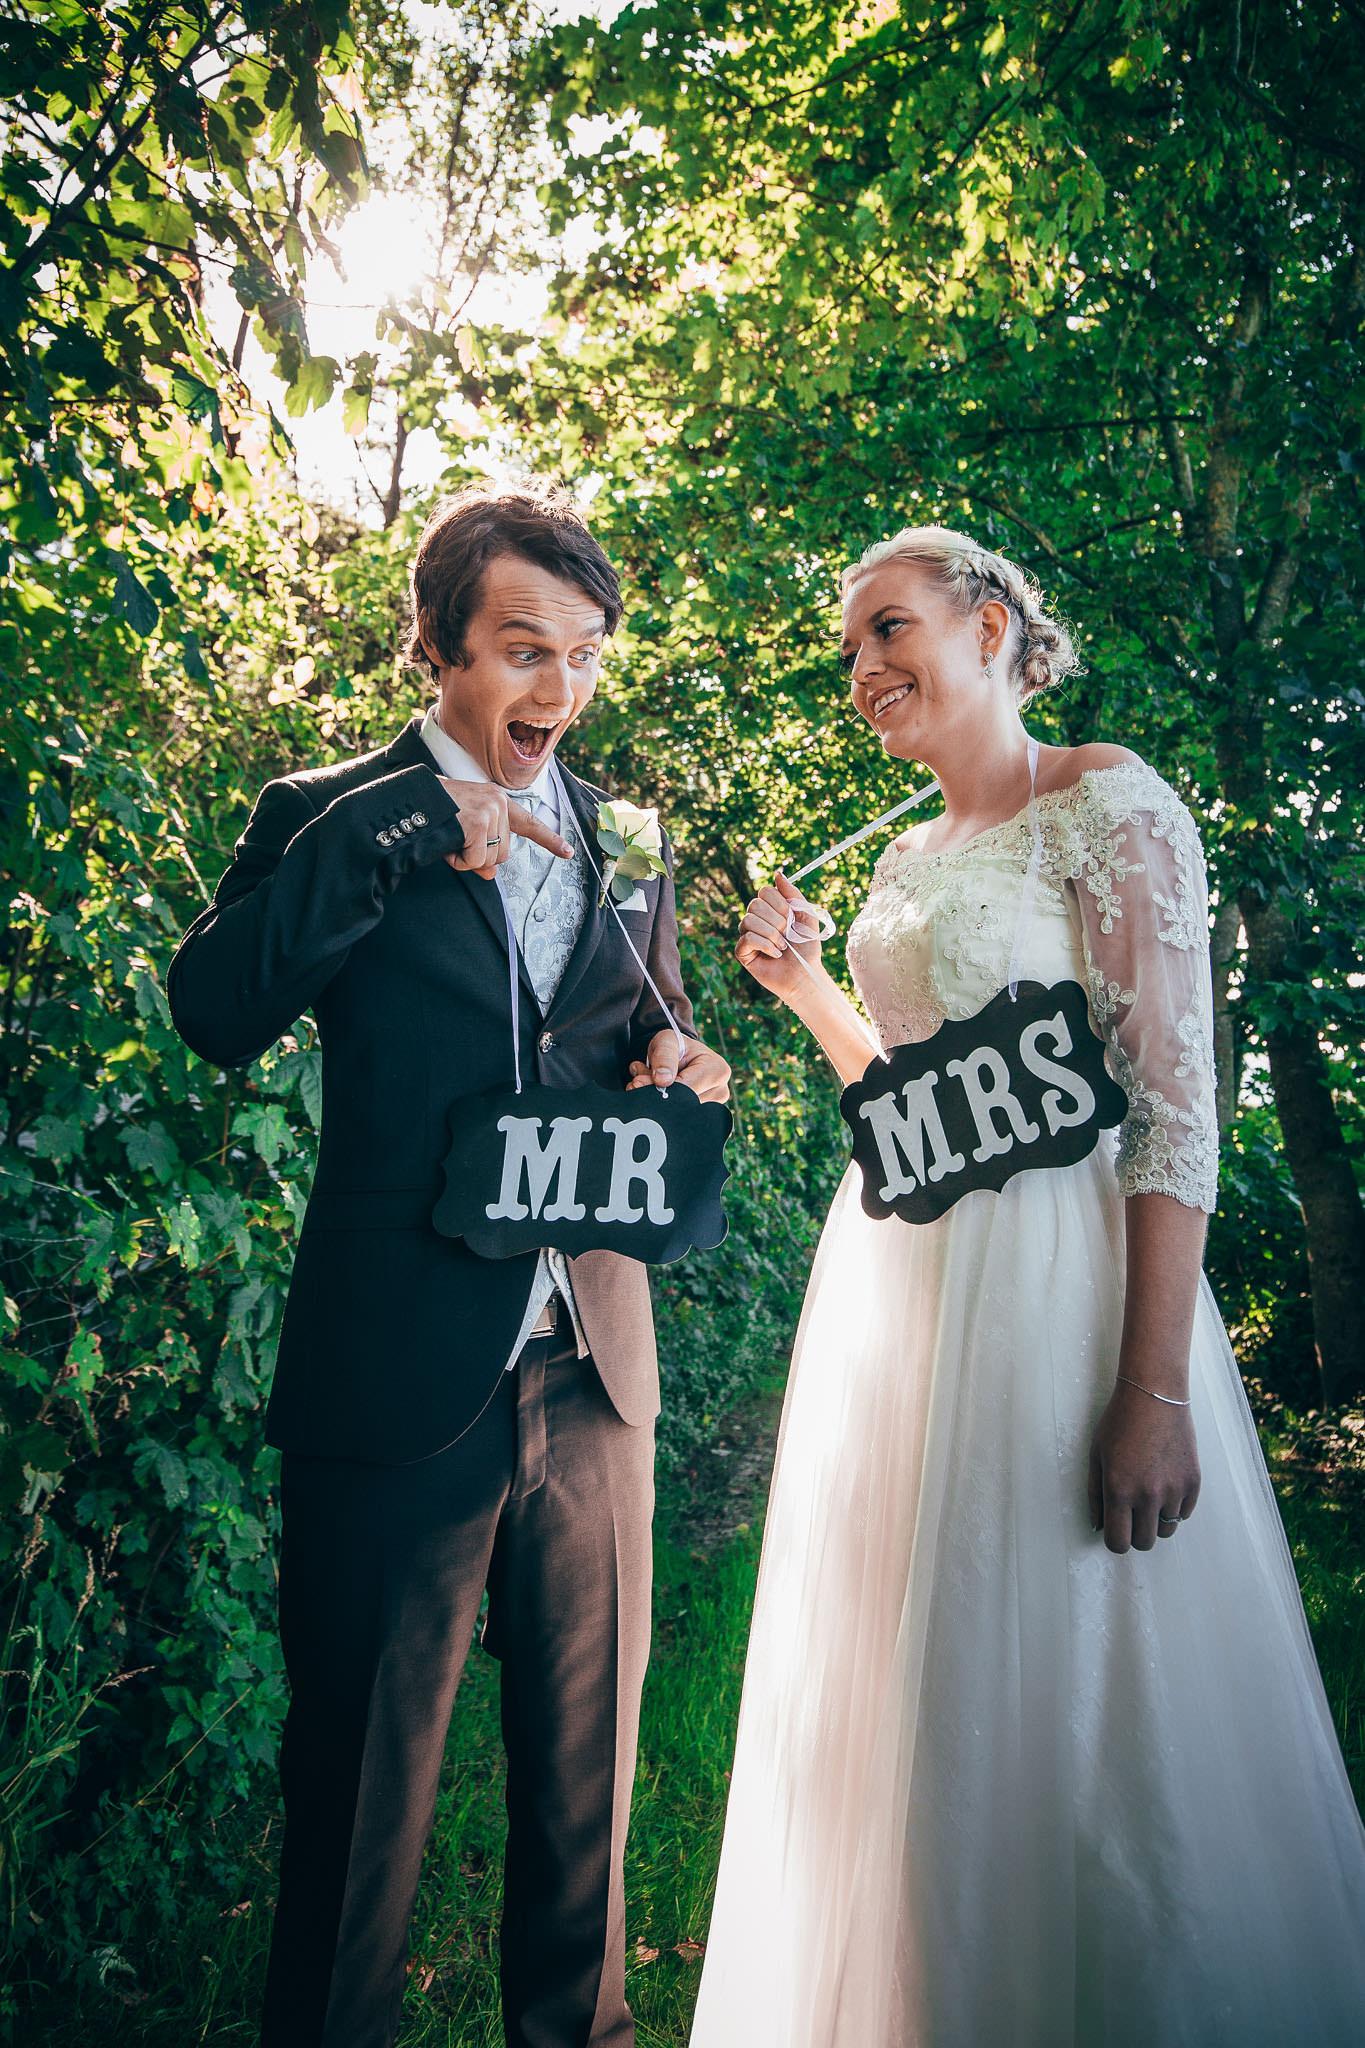 Wedding+Photographer+Norway+Bryllupsfotograf+Casey+Arneson+JT-106.jpg